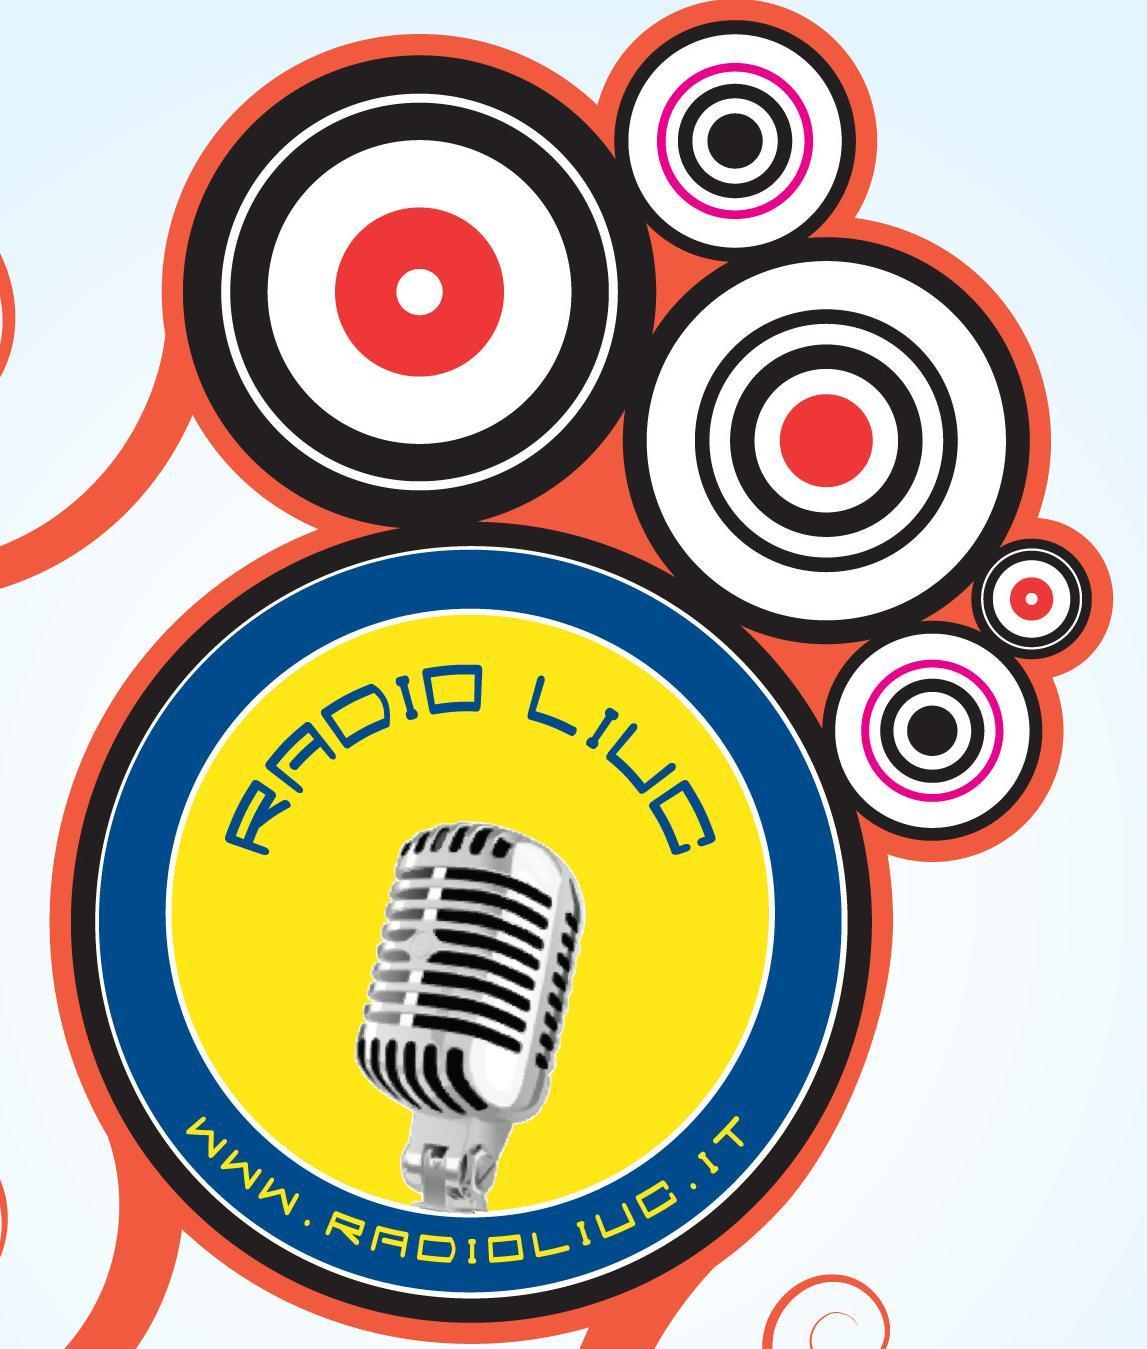 Radio Liuc